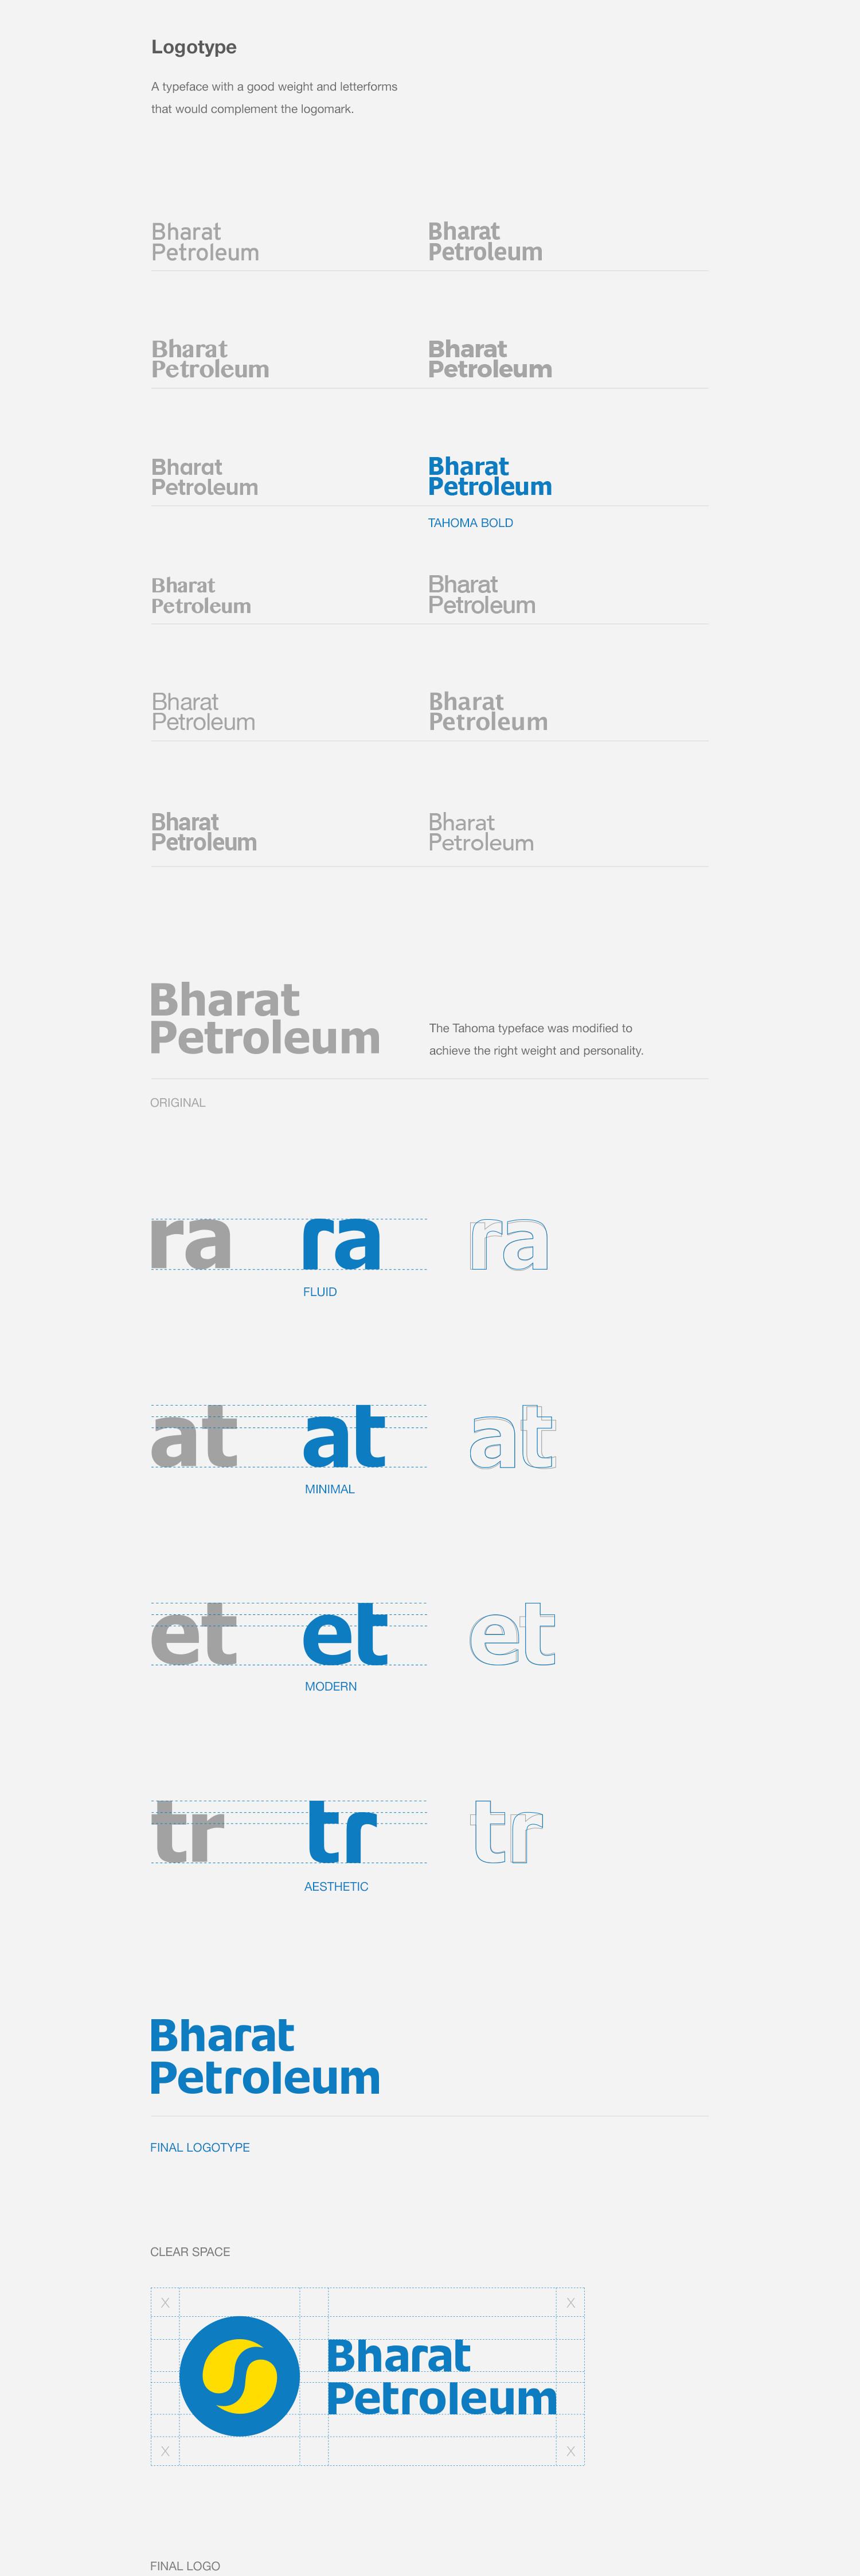 bp-logotype.jpg